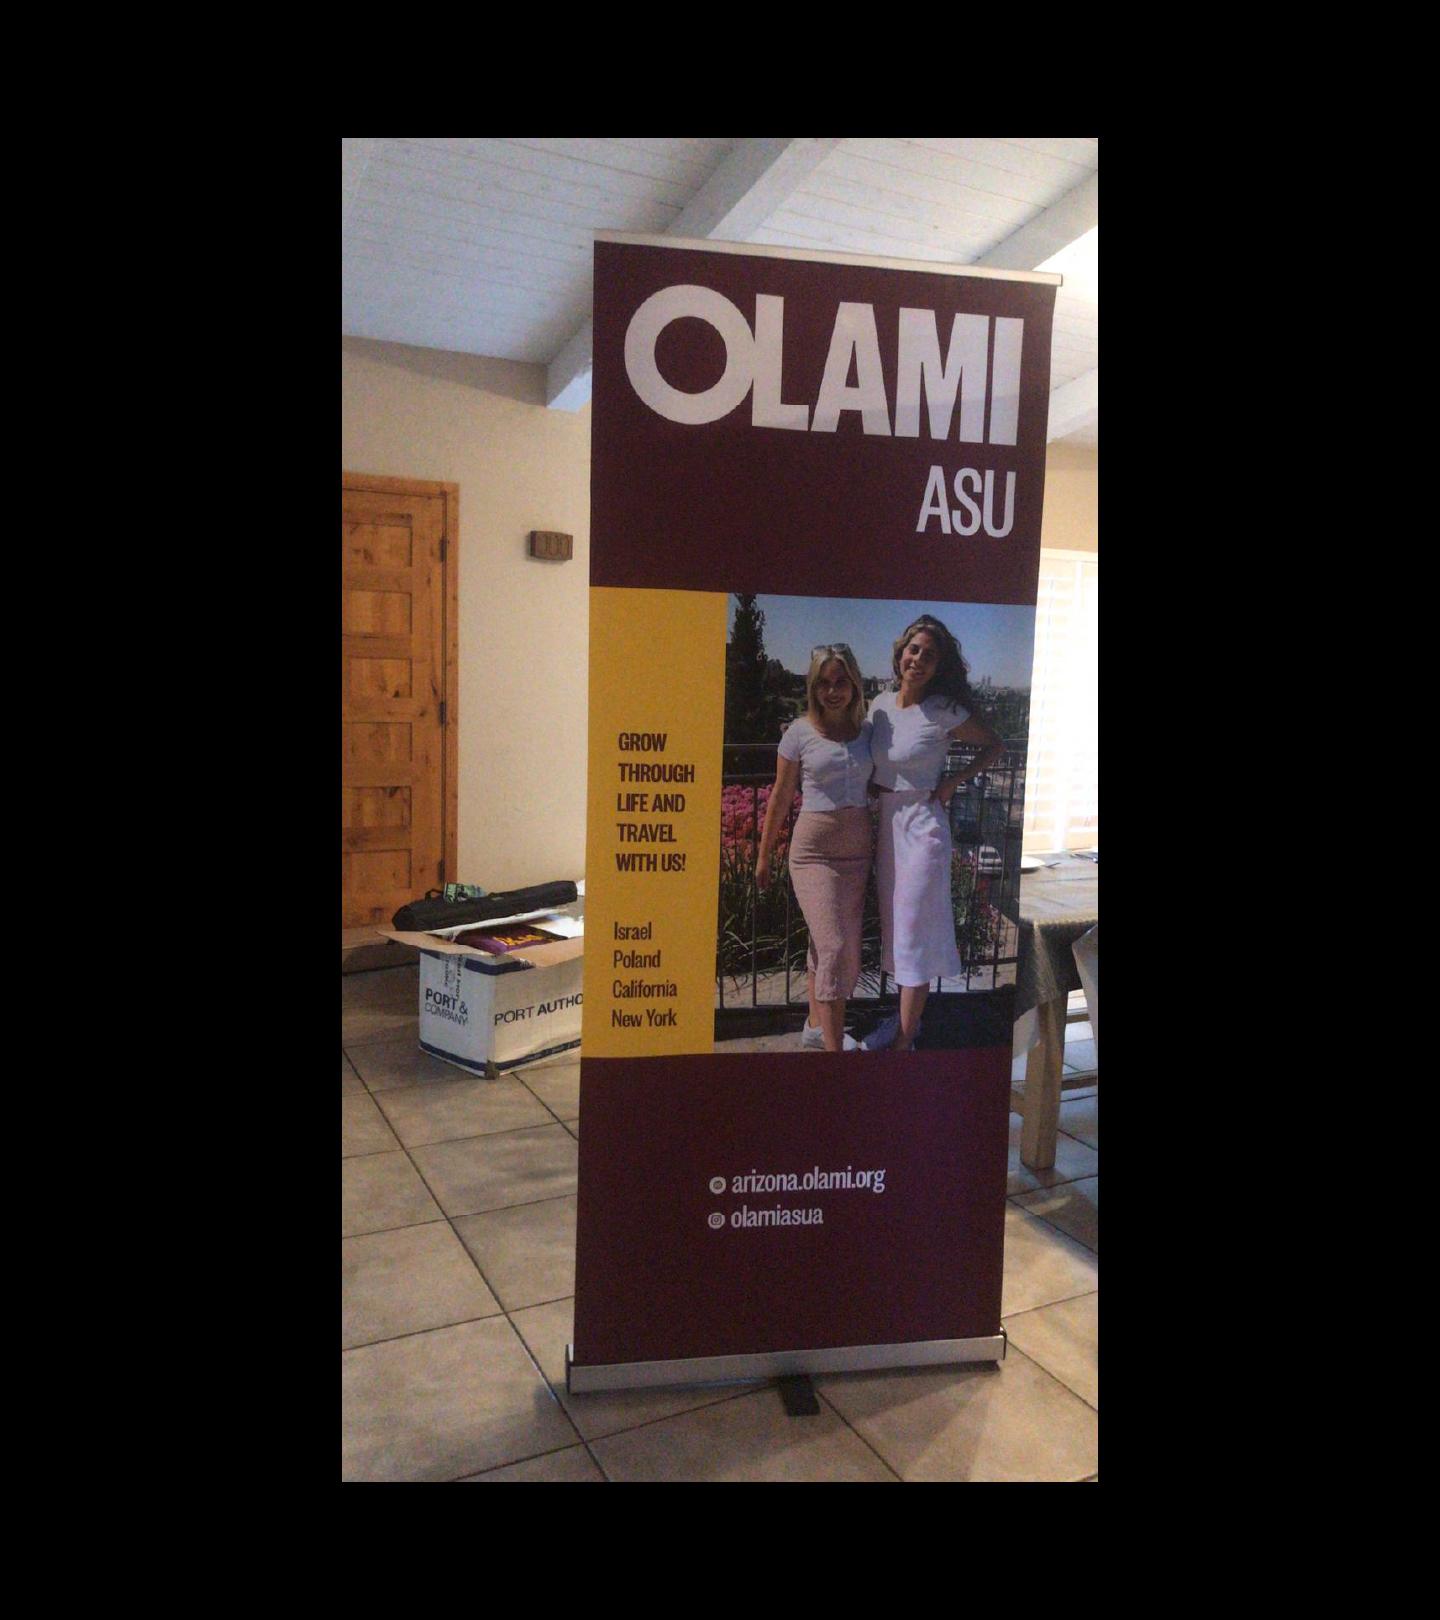 Olami-1-copy-2j